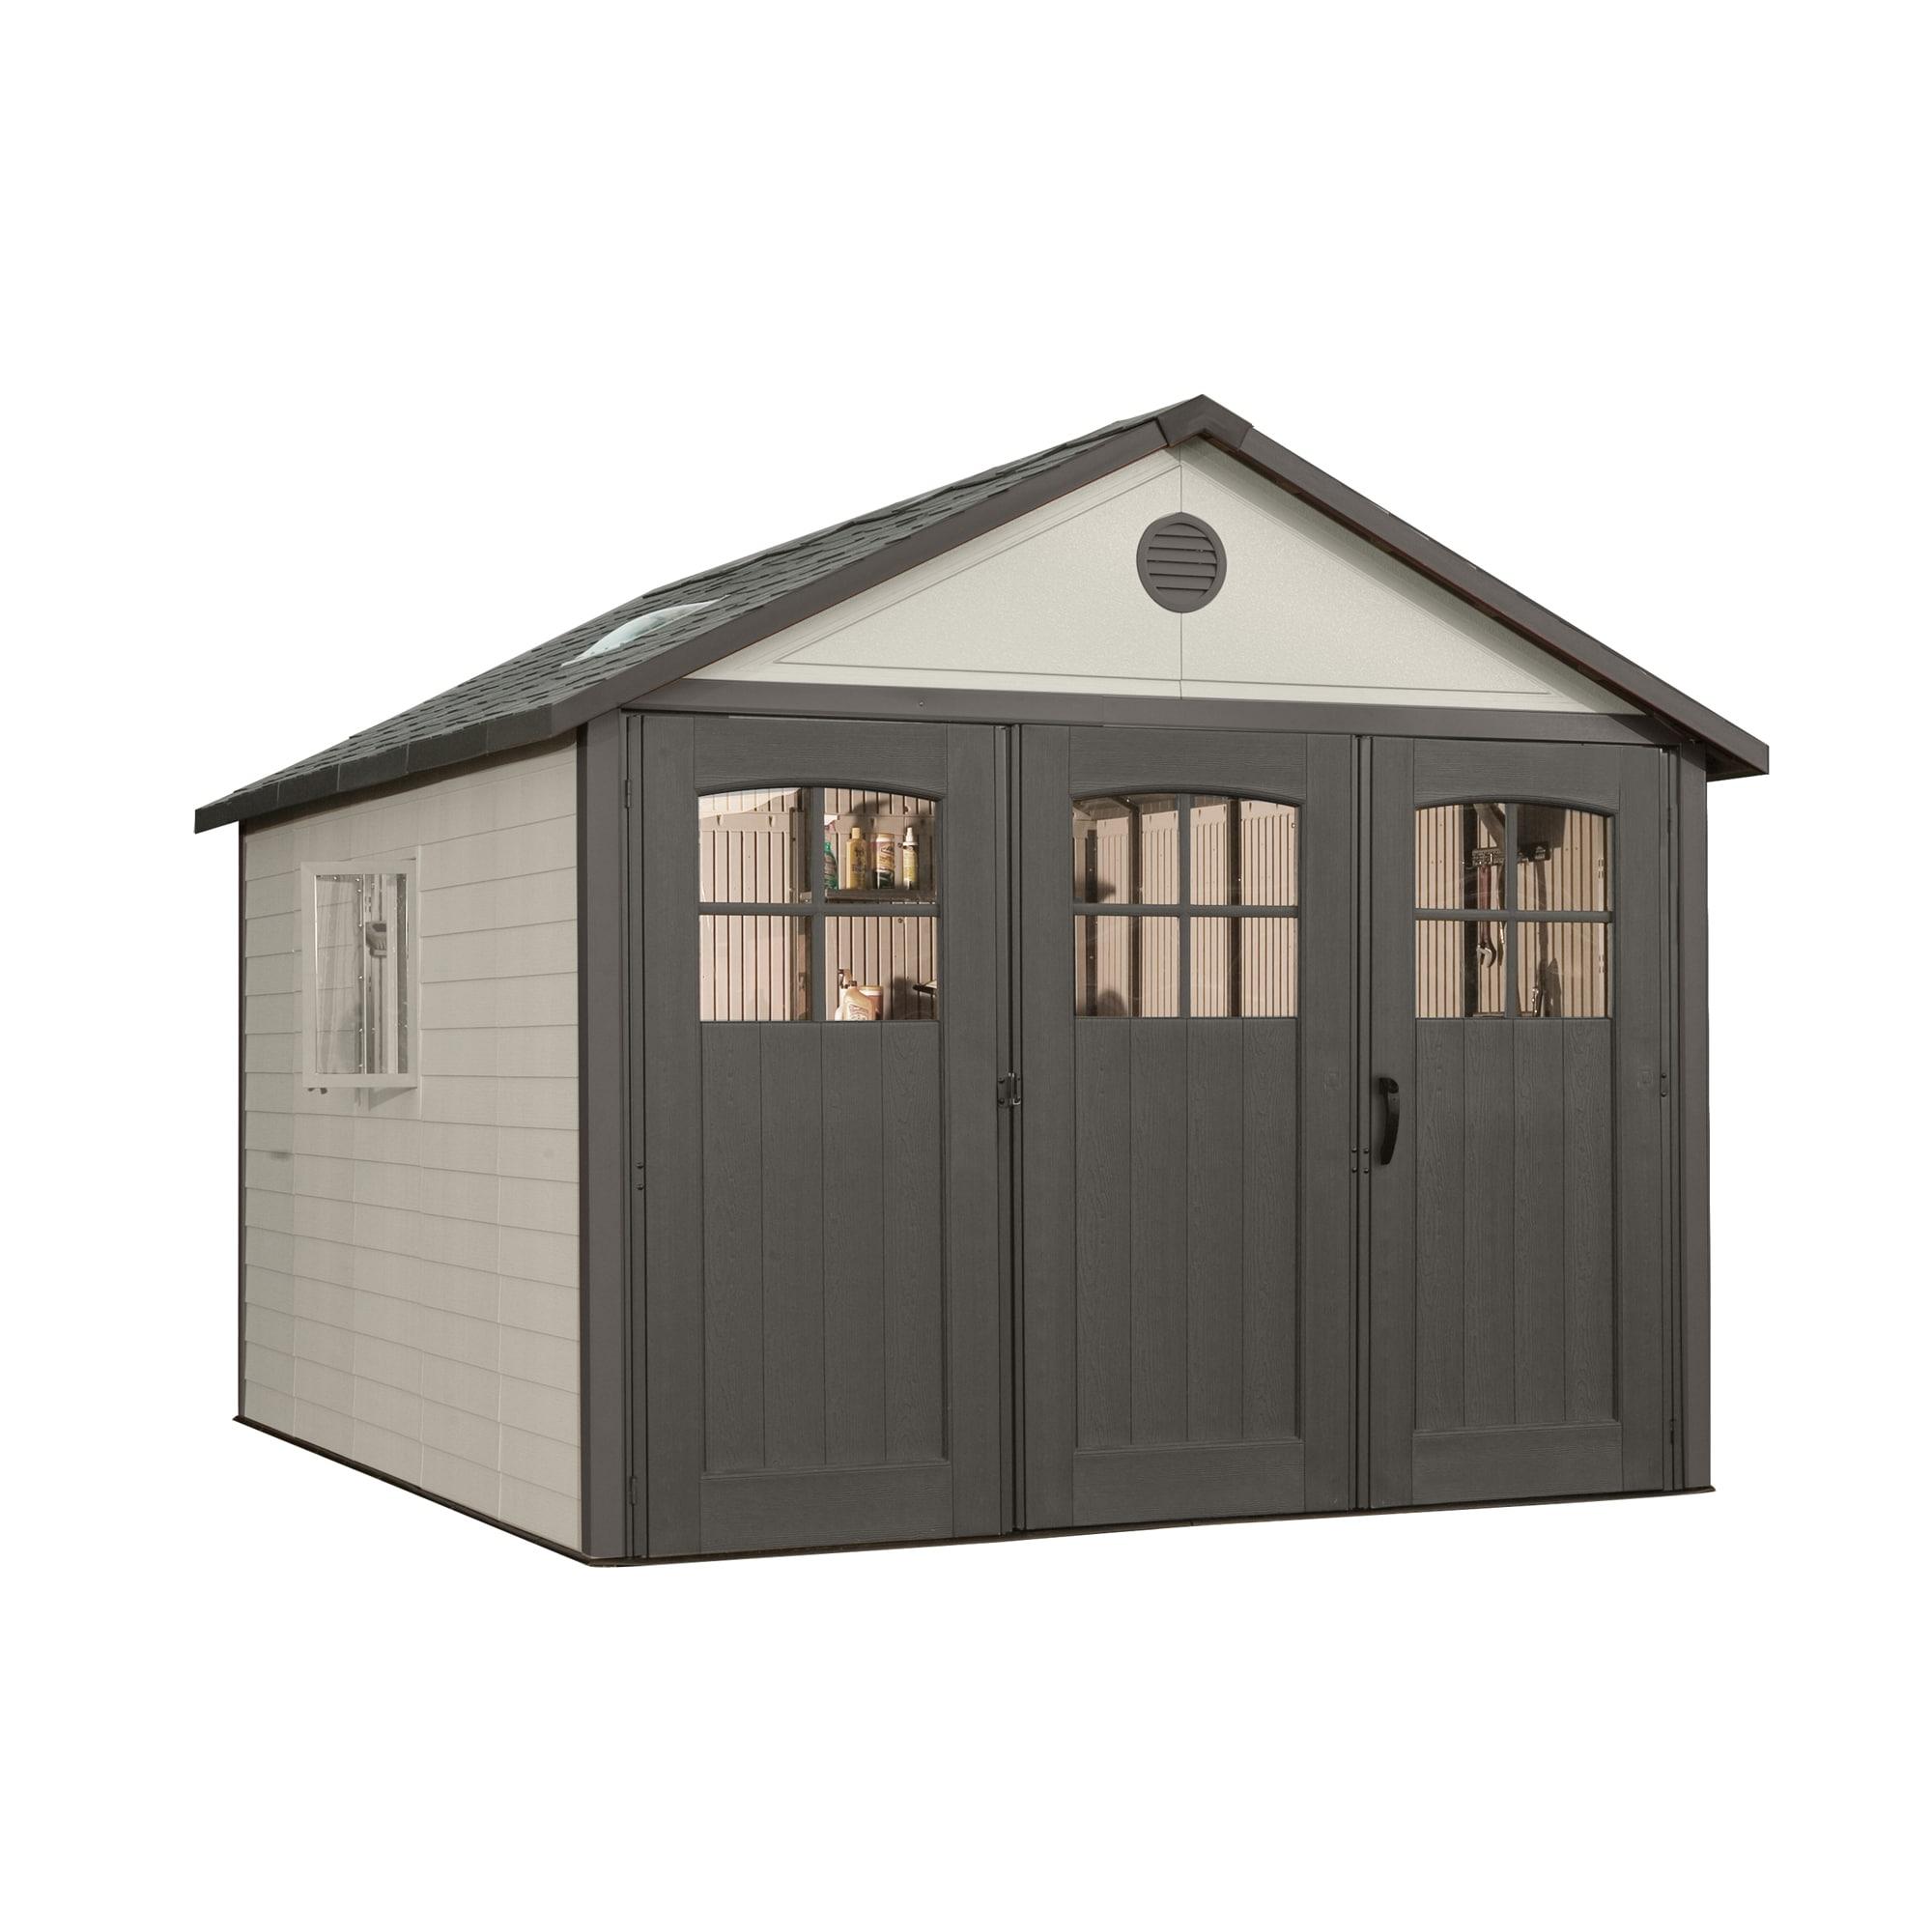 Lifetime Storage Building (11' x 11'), Grey metal #6417